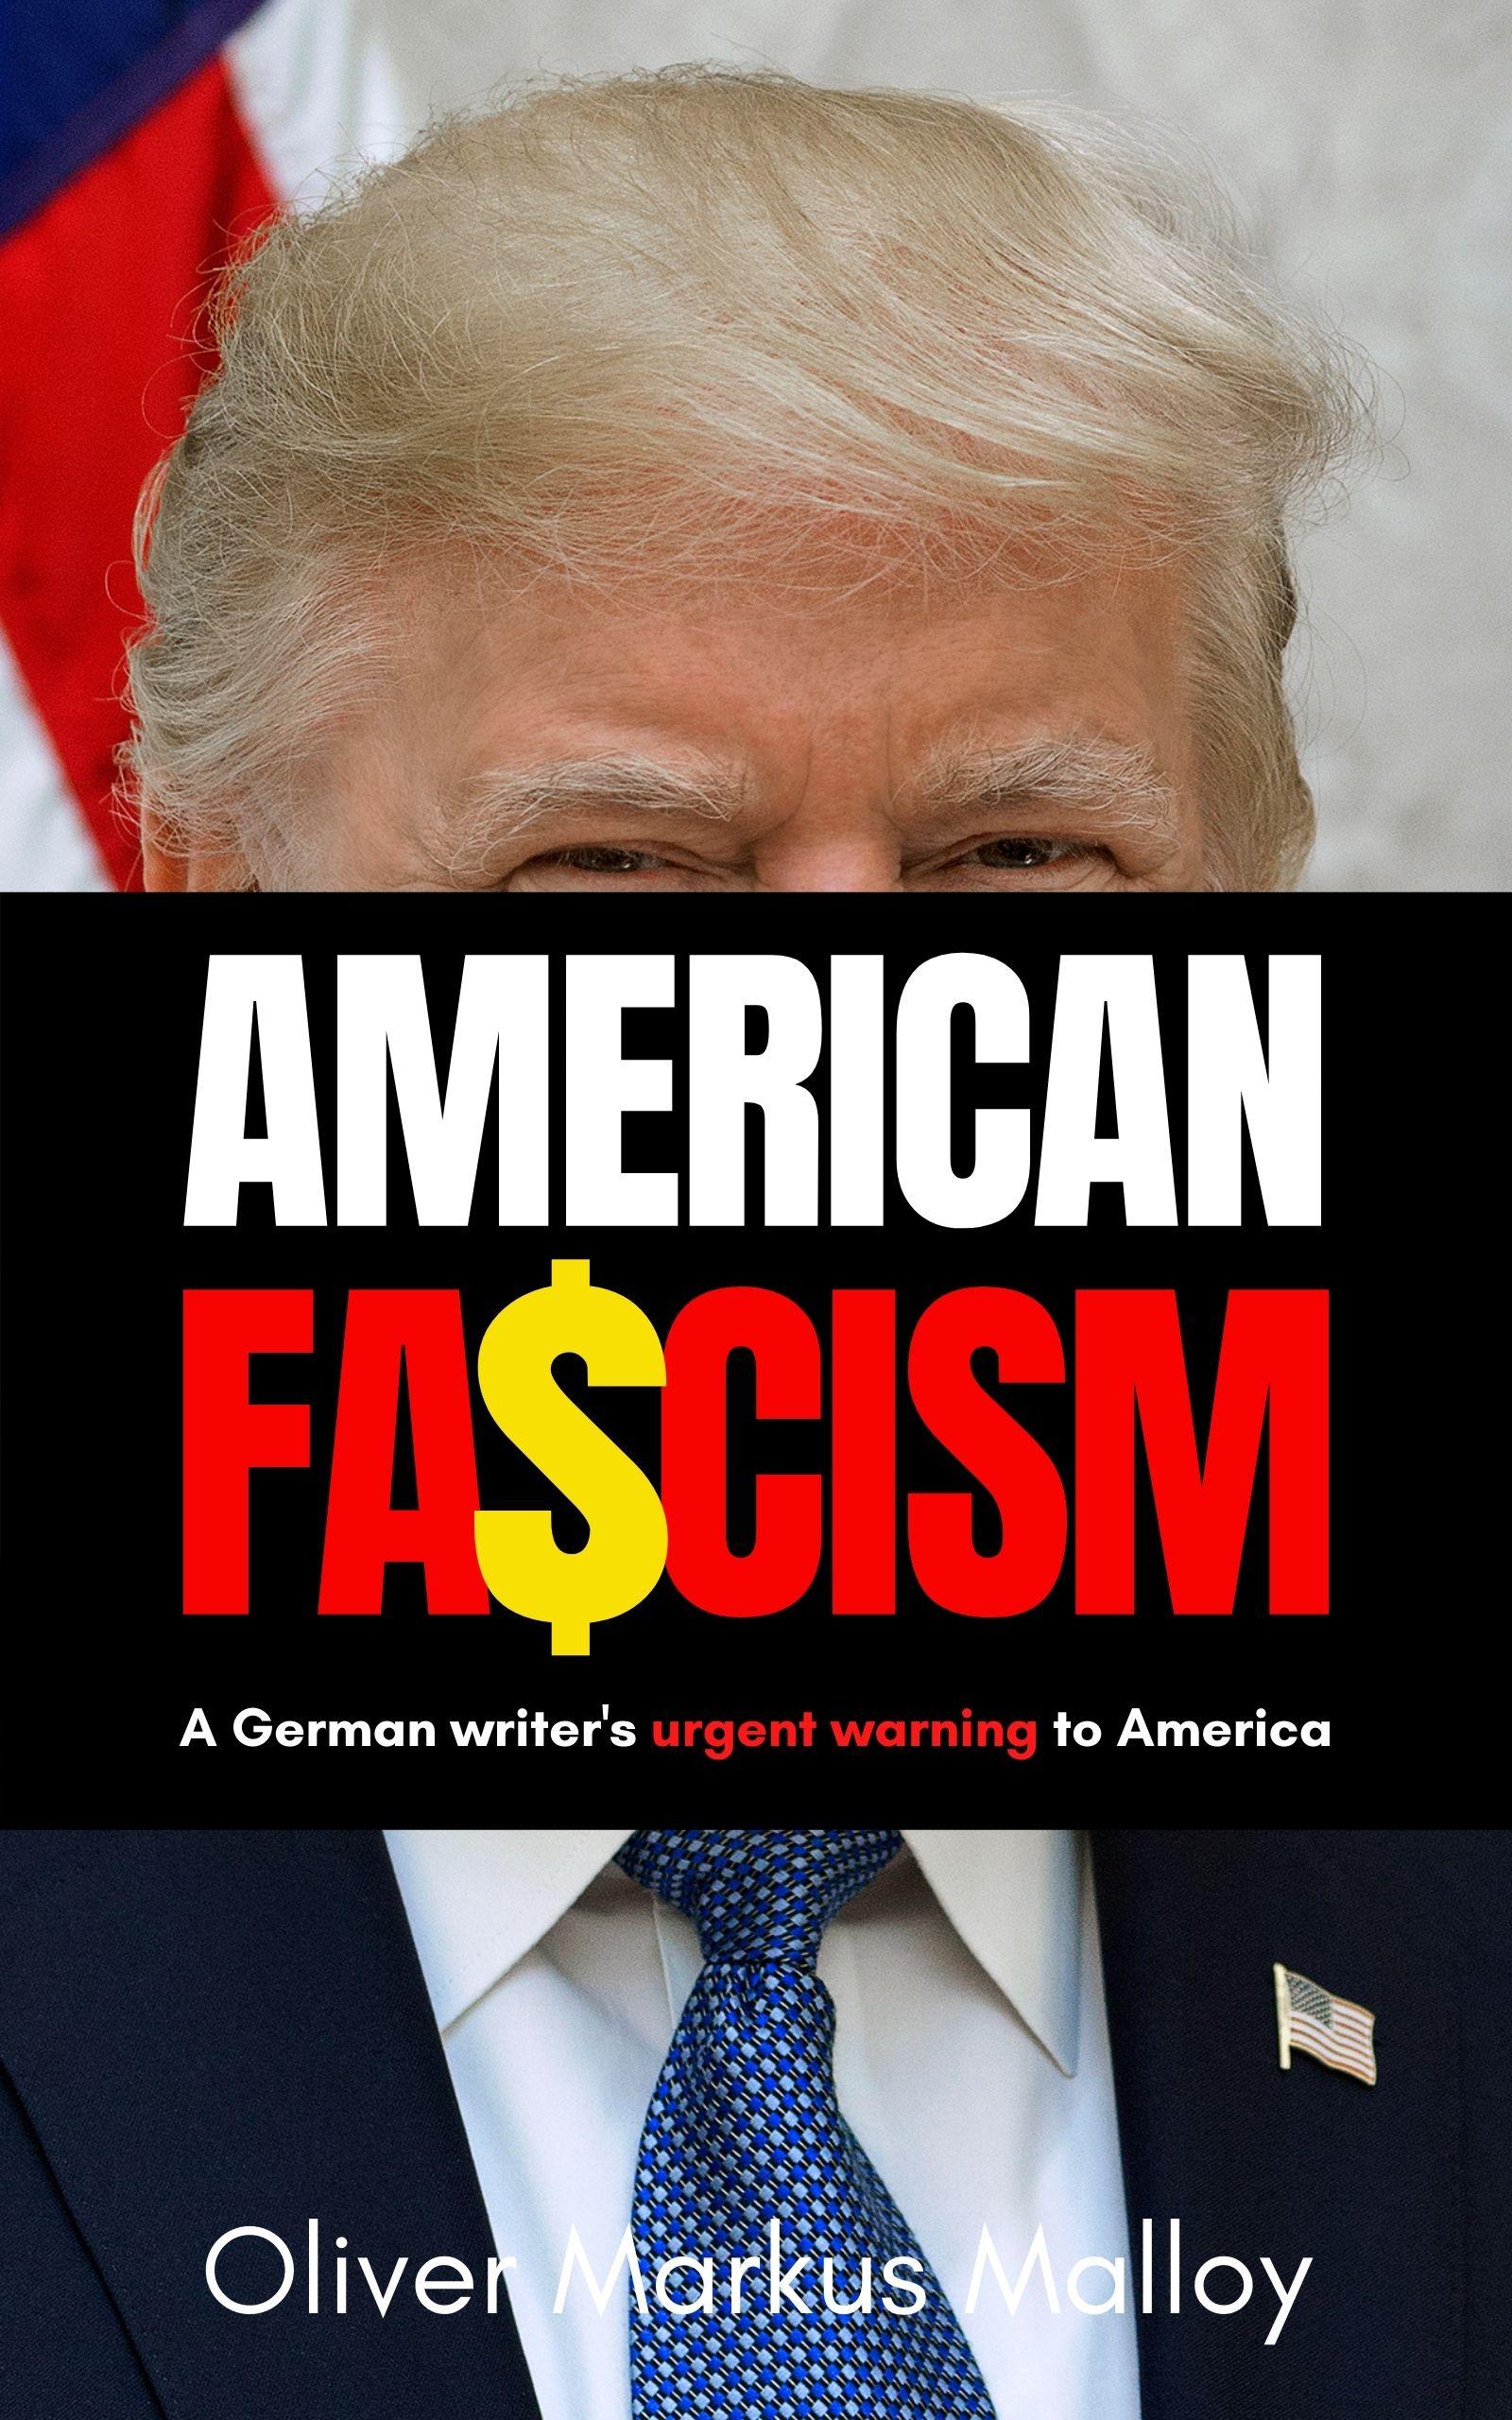 American Fascism: A German Writer's Urgent Warning To America